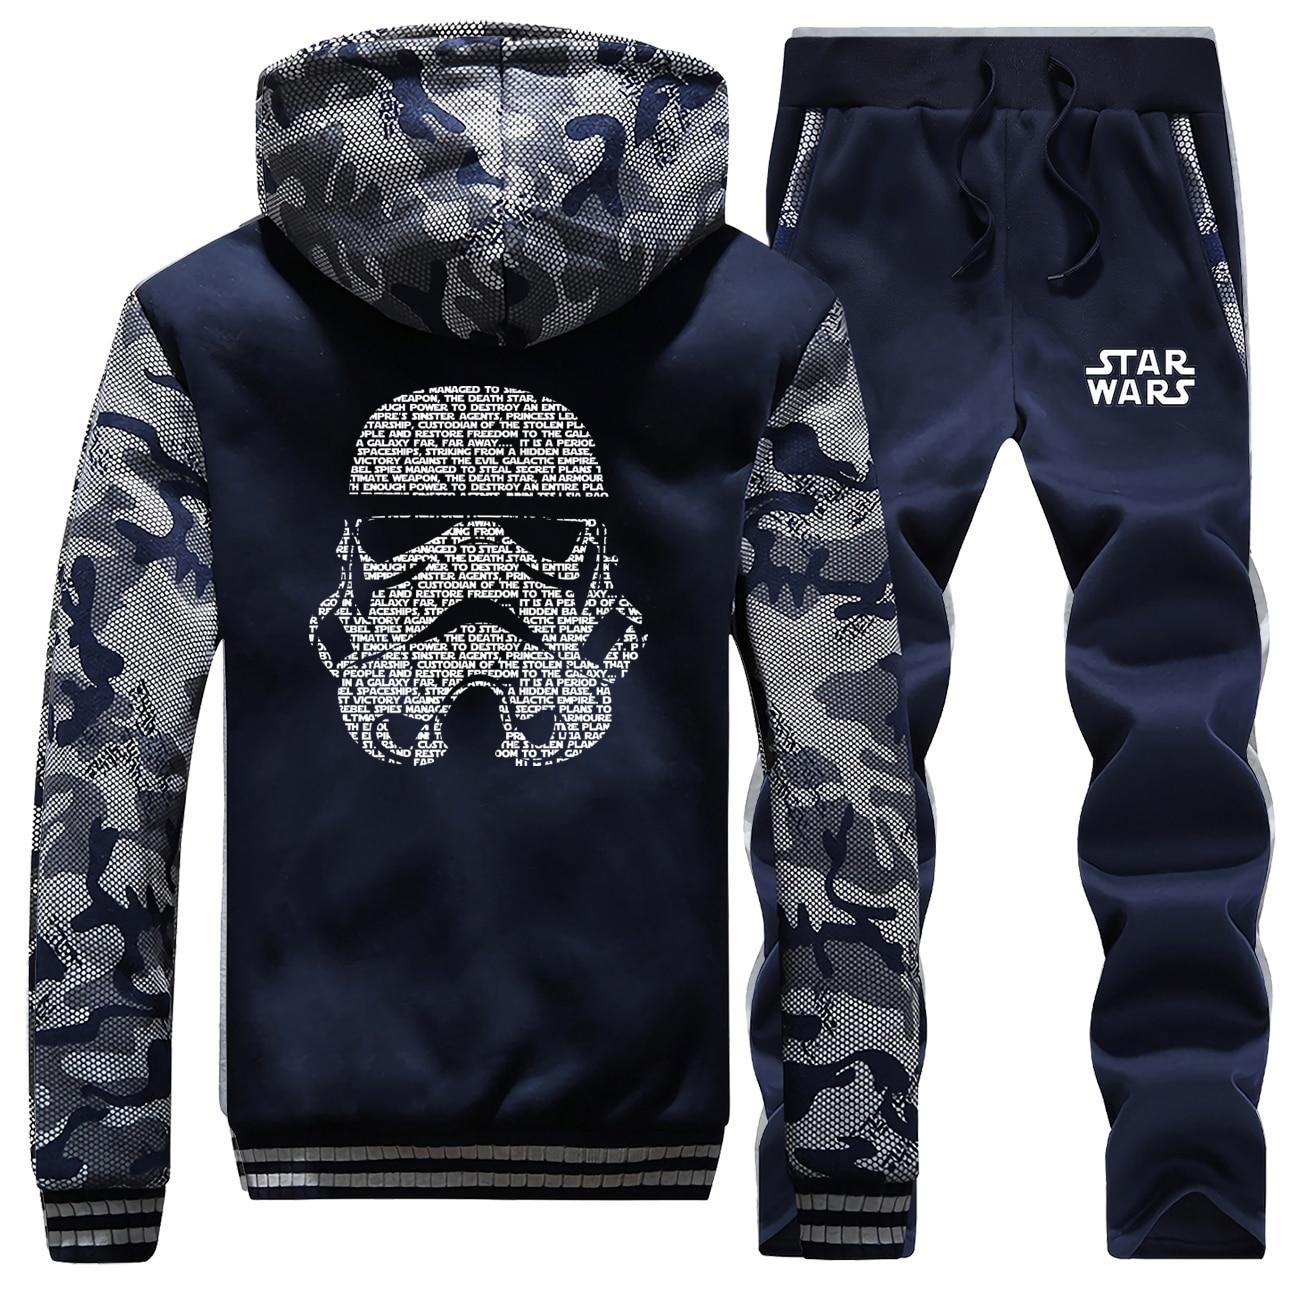 Srar Wars Jacket Pant Set Men Tracksuits Selfie Stormtrooper Hoodies Pants Suit Sets Winter Thick Camo Sweatshirt Sweatpants